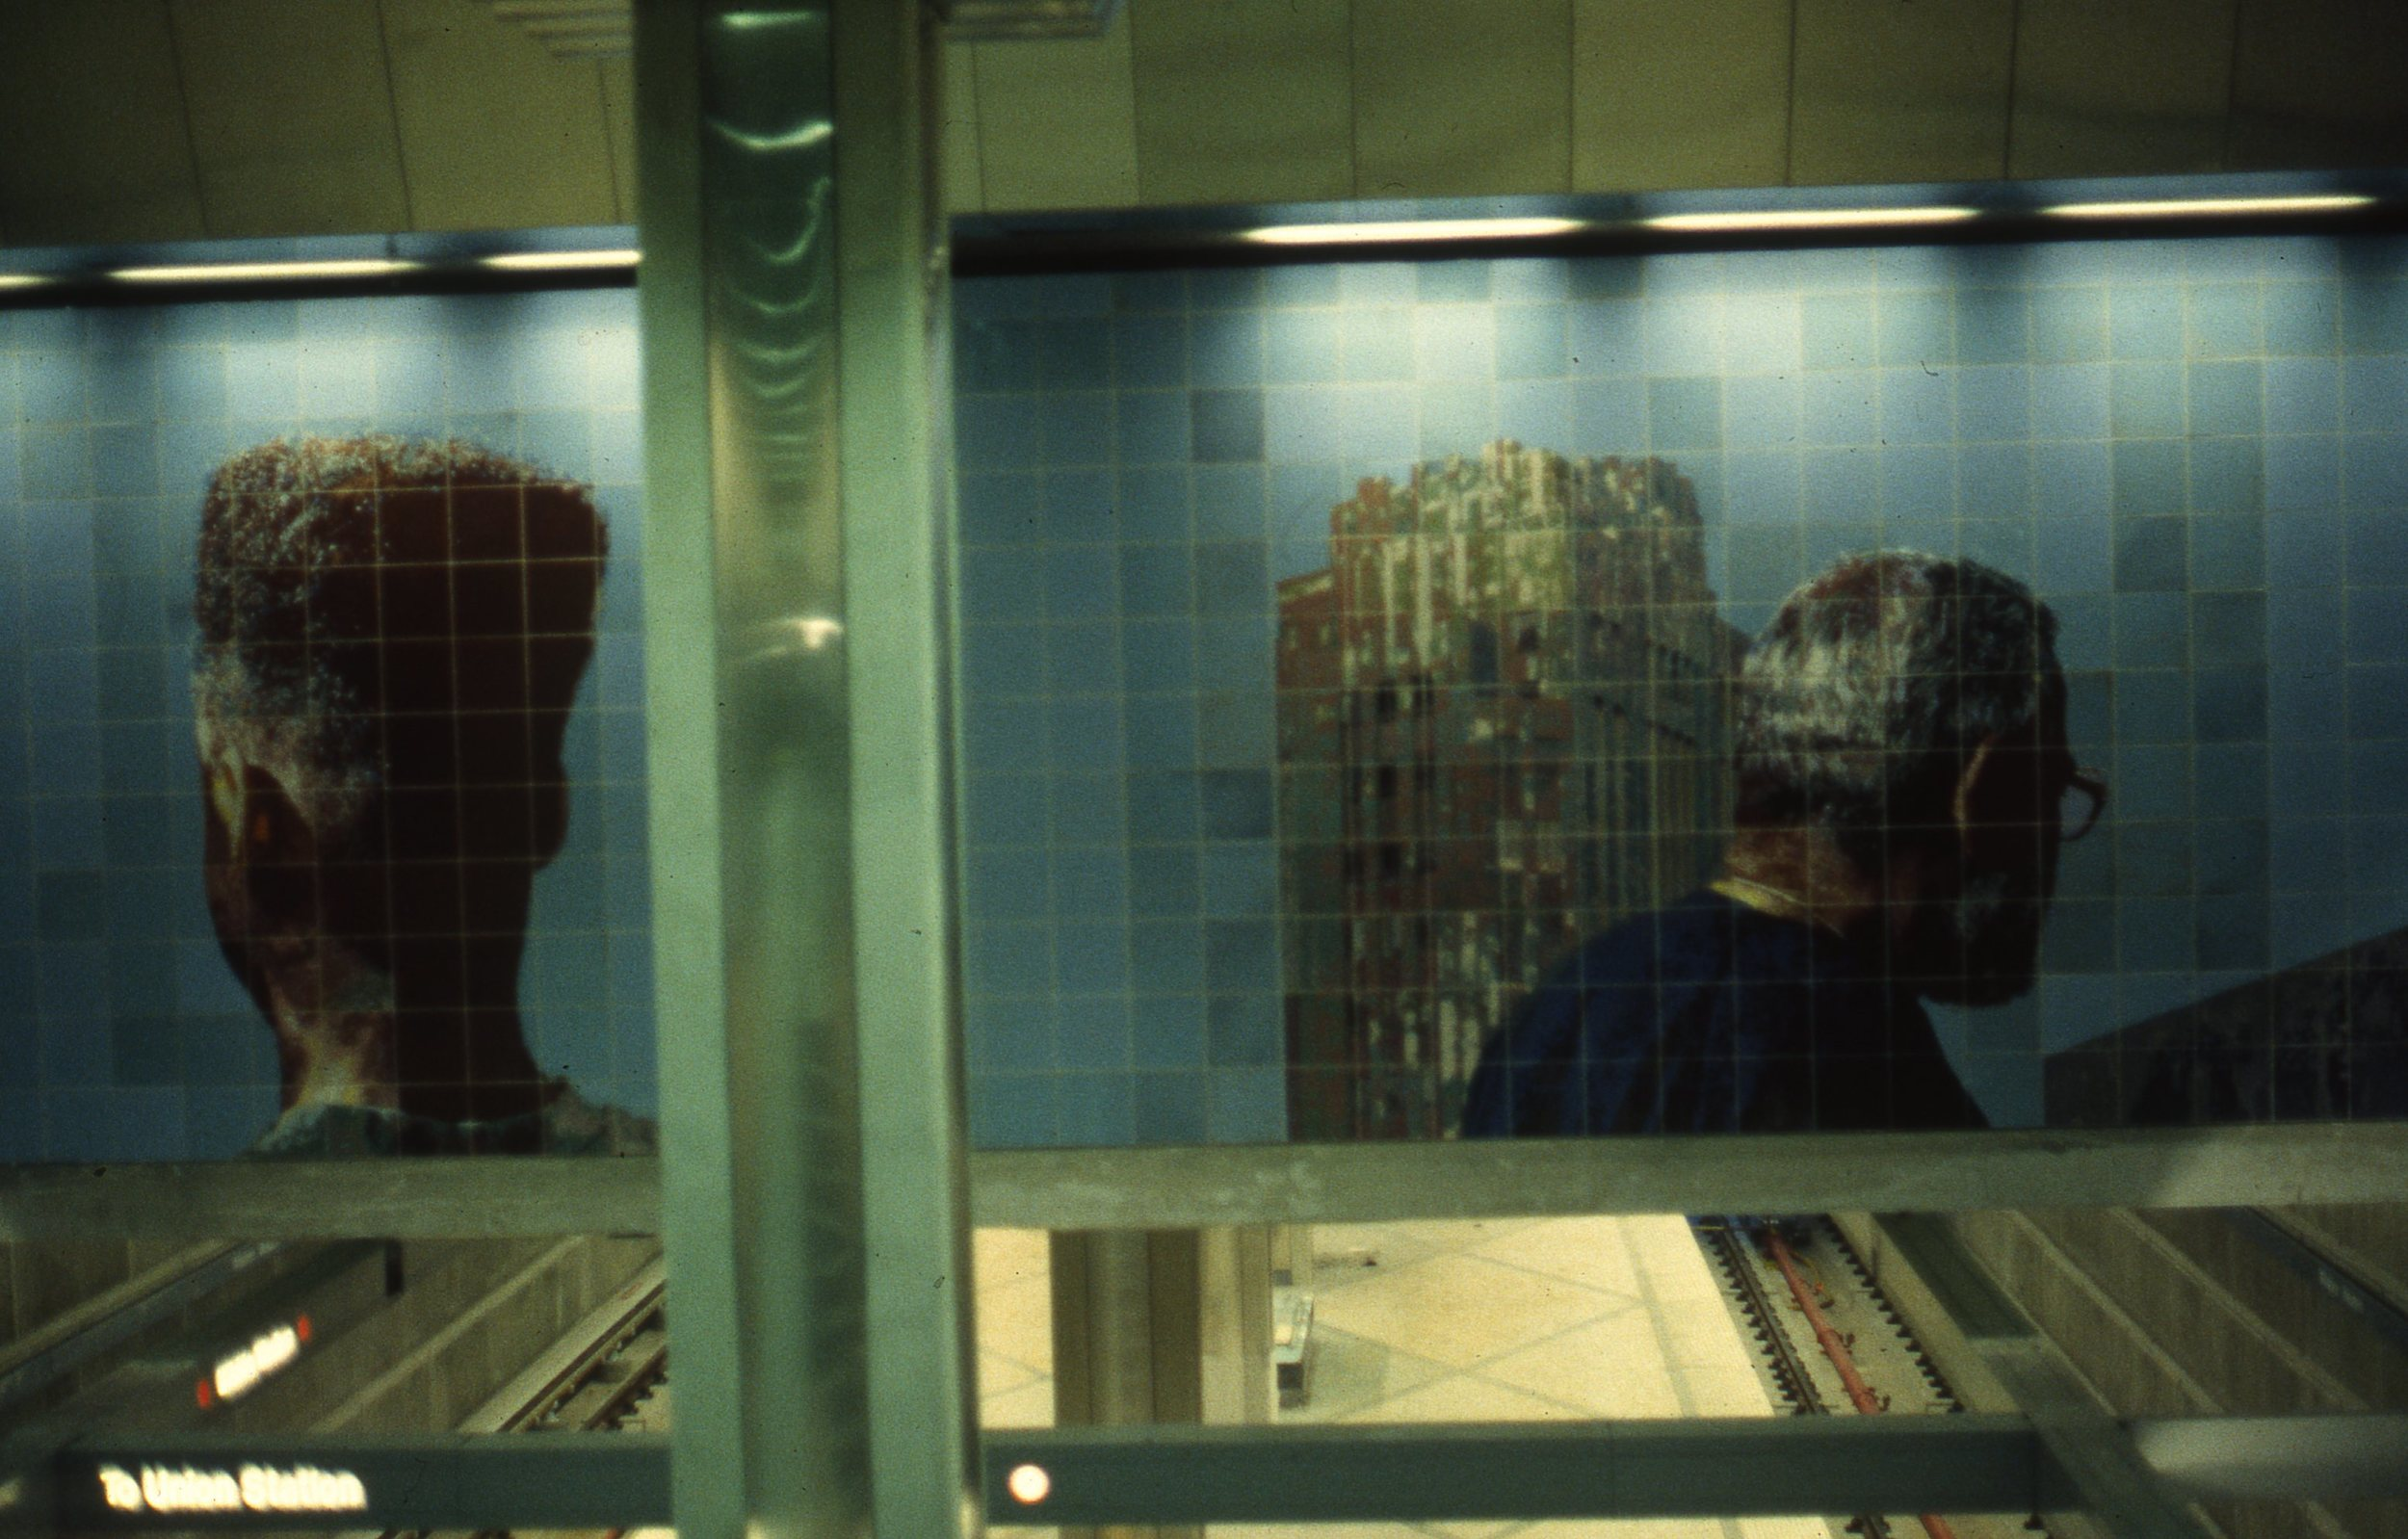 """People Coming, People Going"", West wall detail    1996   CeramicTile   10 x 30 feet   © Richard Wyatt Jr."